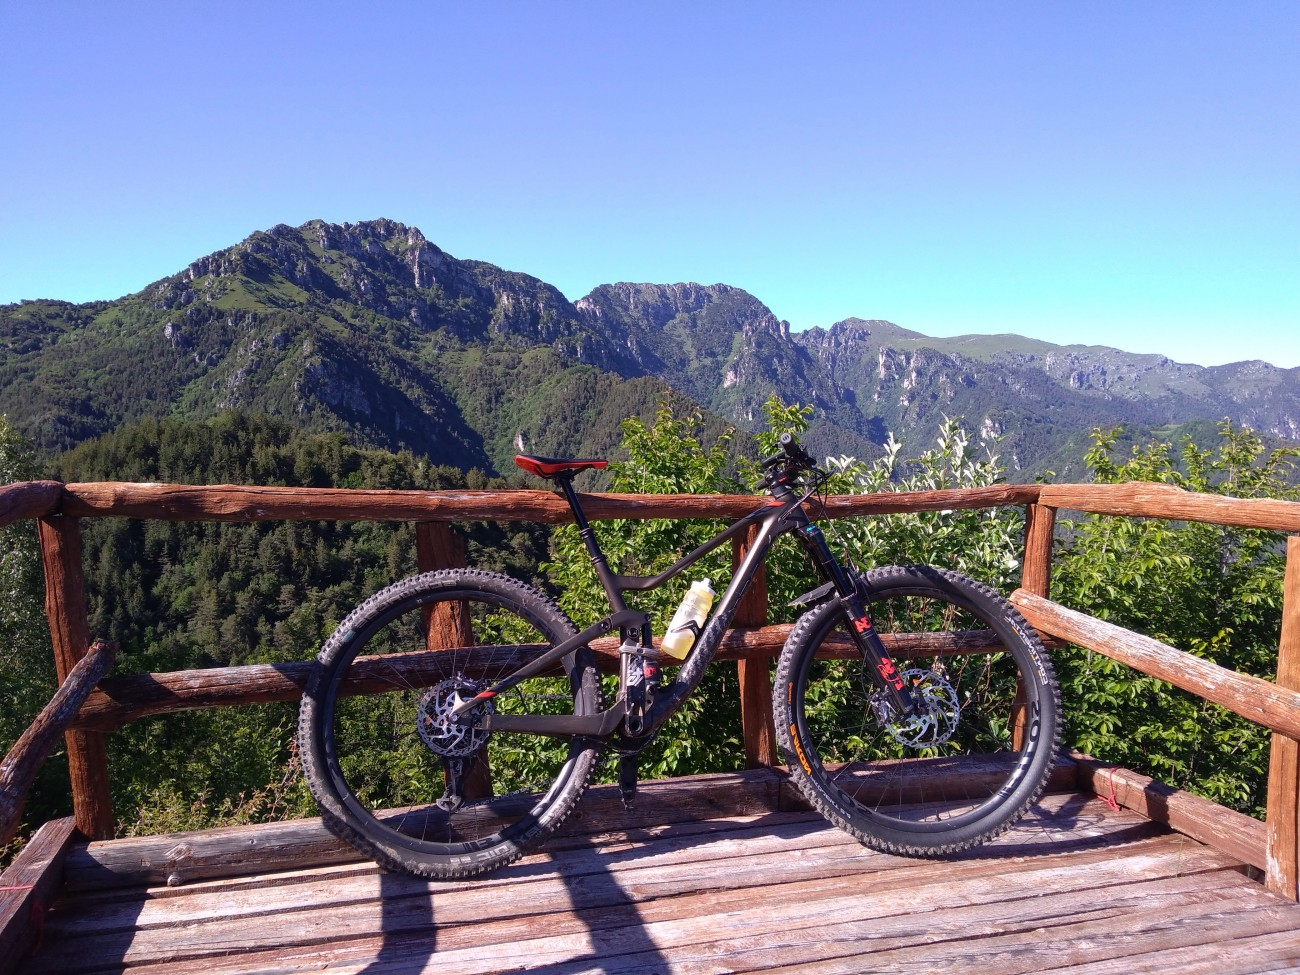 Italian Mtb bicycle with WM-i29A carbon fiber wheels